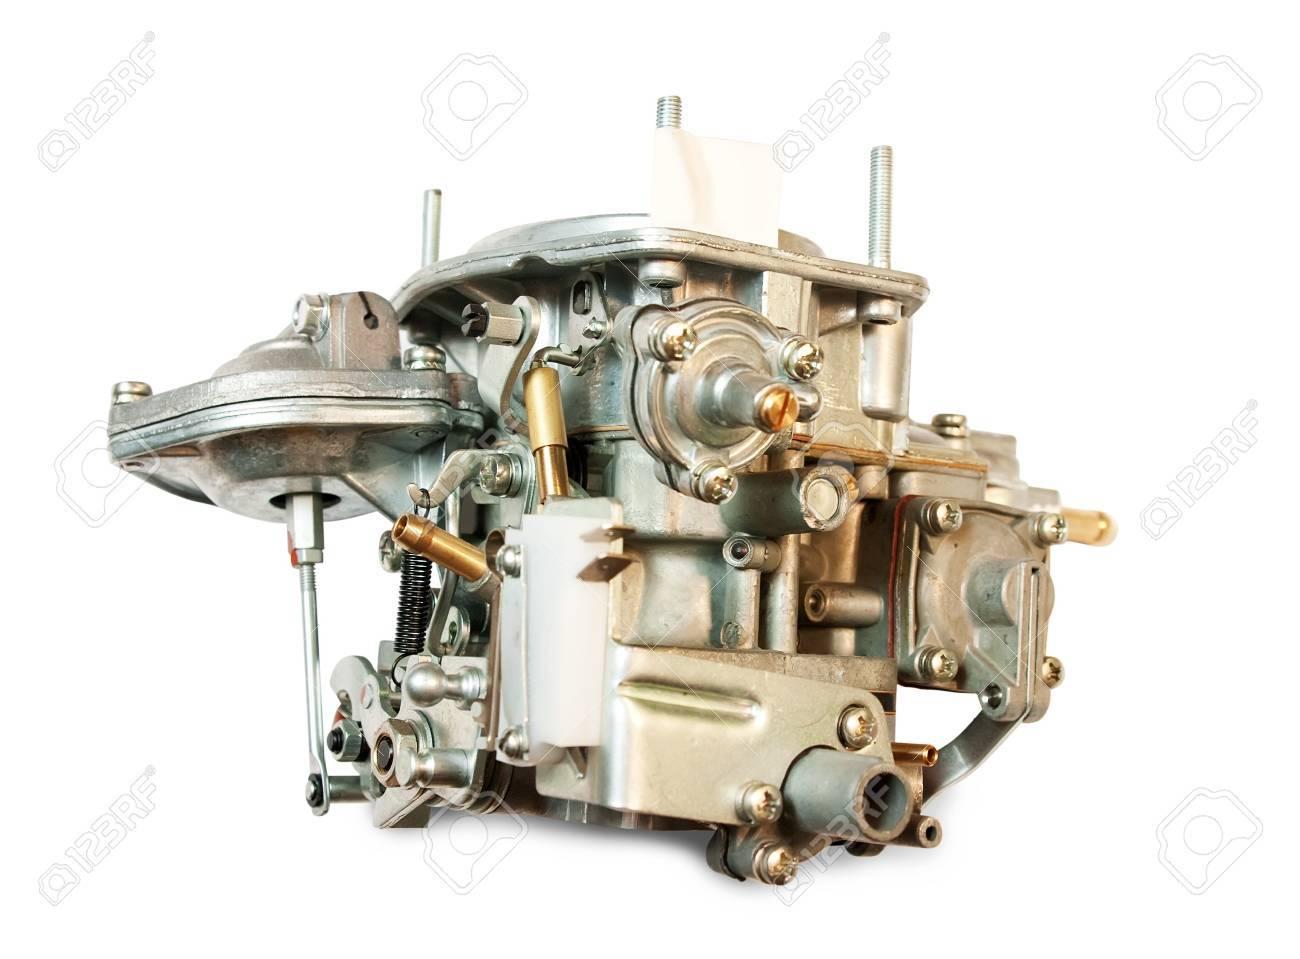 carburetor for automobile. Stock Photo - 7291873